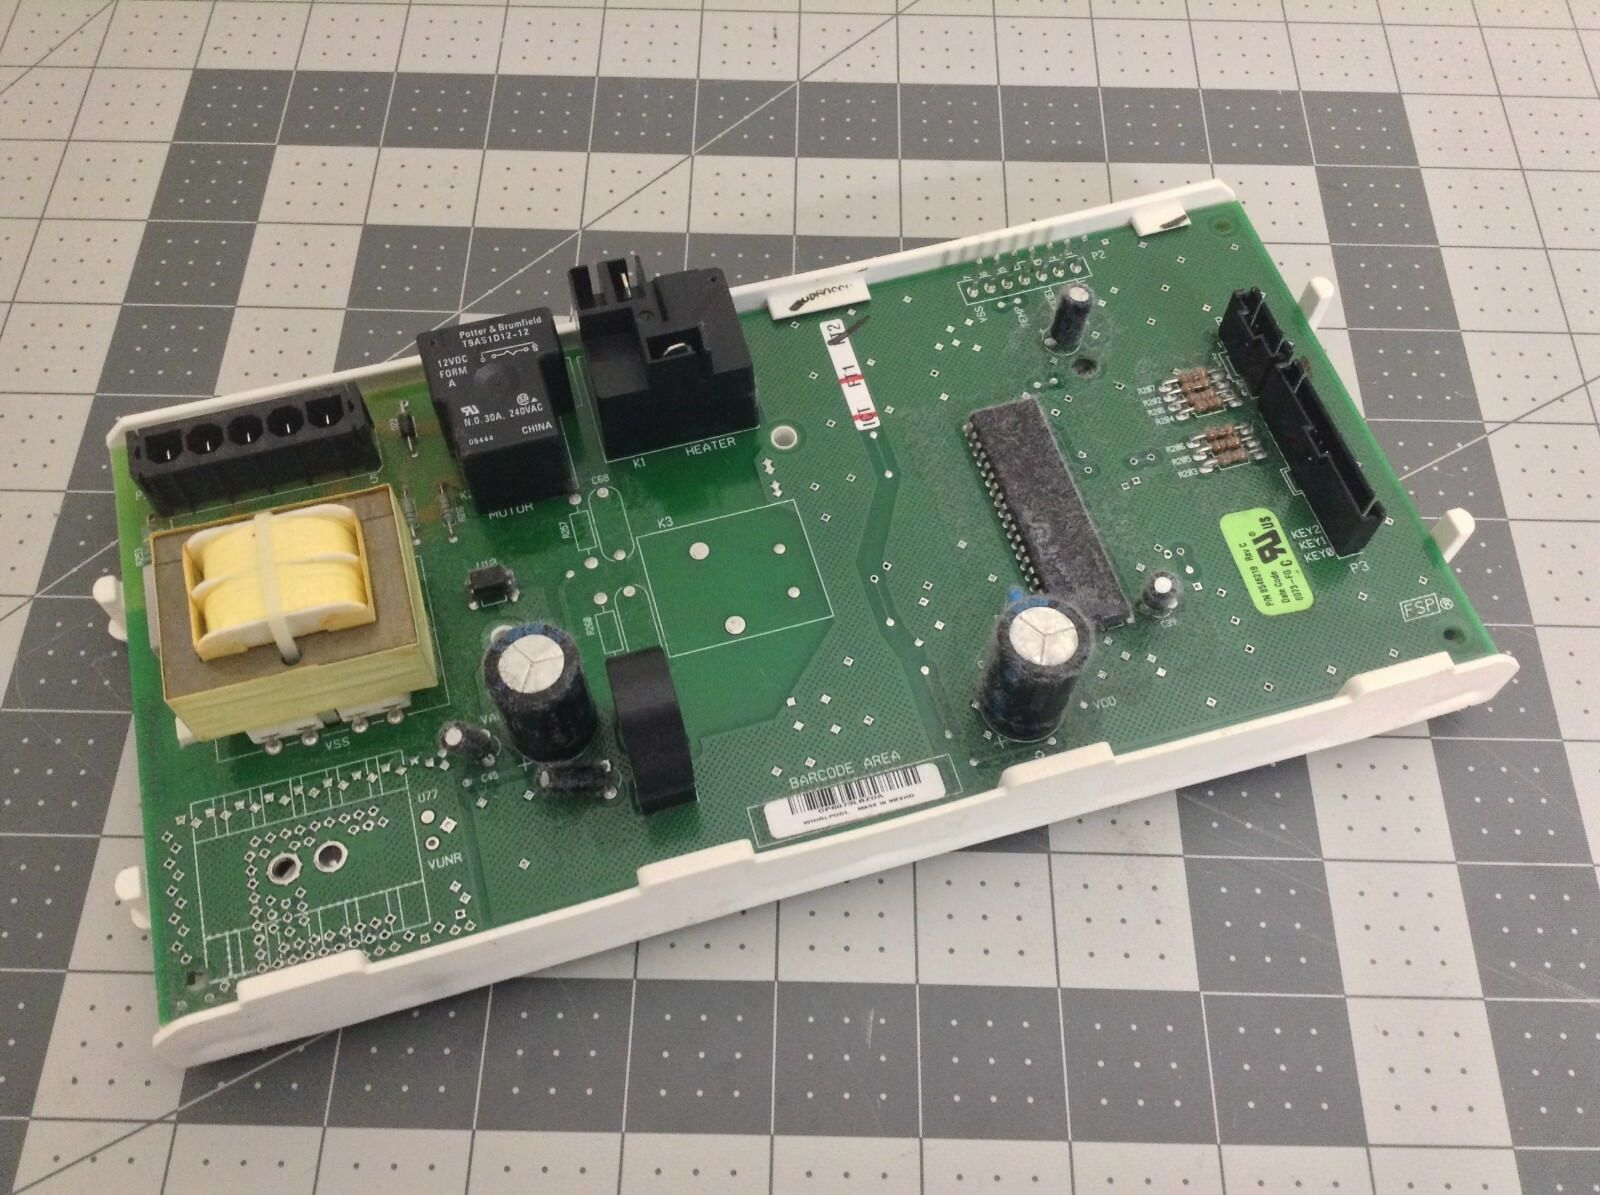 Whirlpool Kenmore Dryer Control Board WP8546219 8546219 3980062 8557308